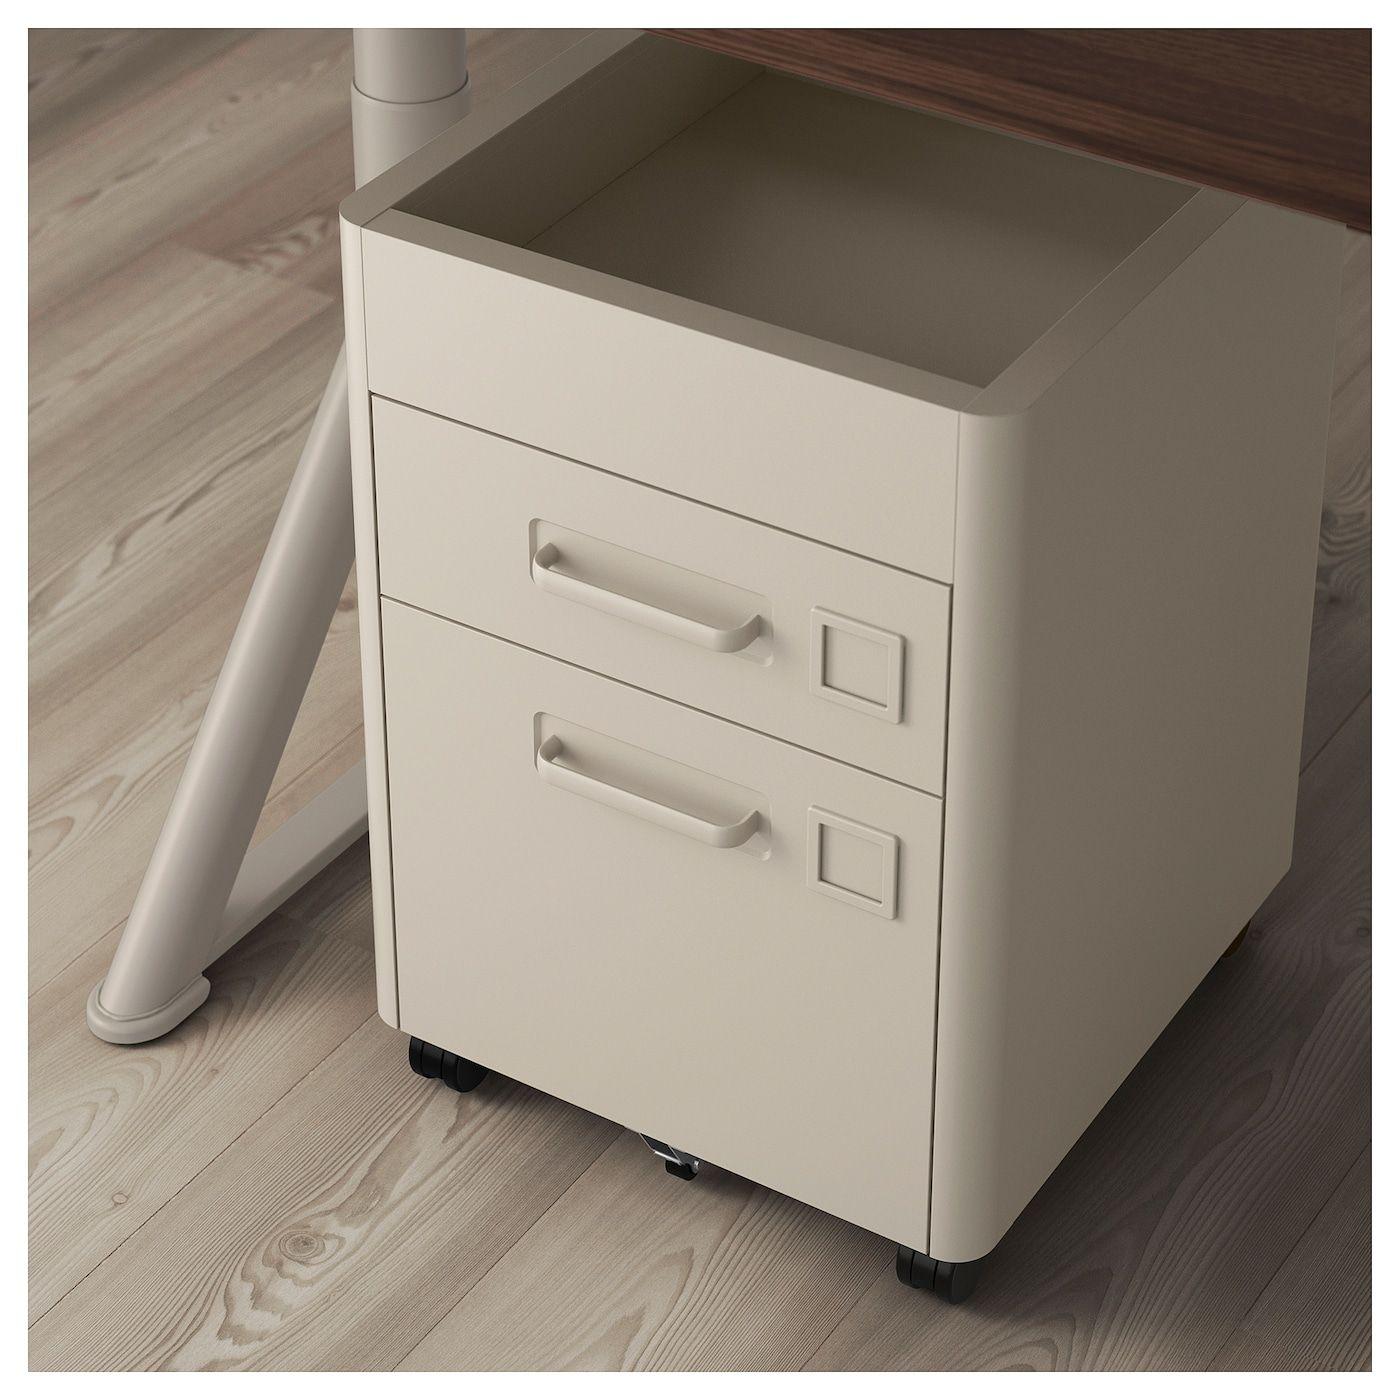 IDÅSEN Drawer unit with smart lock beige 16 1/2x24